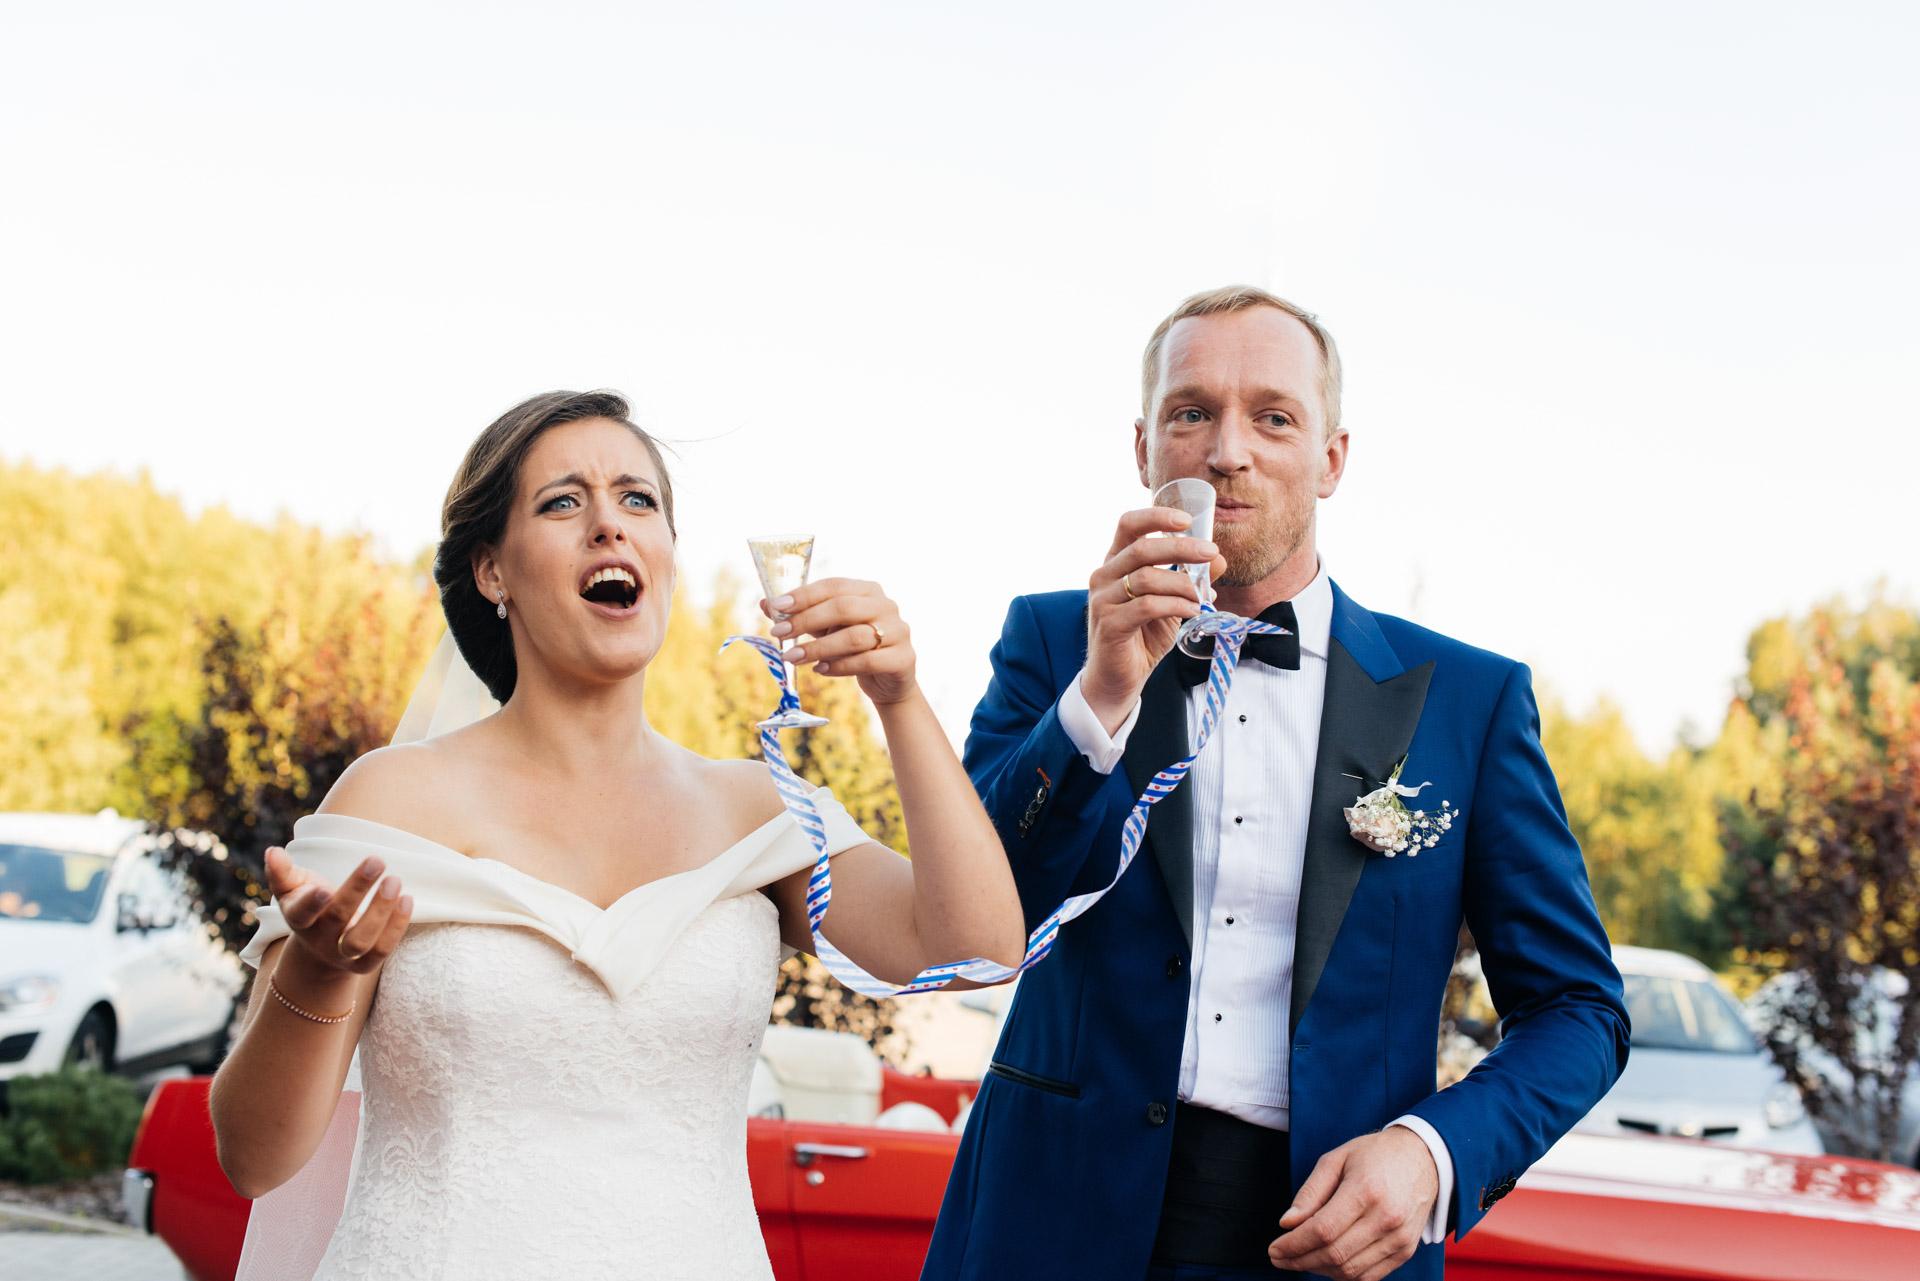 Natalia i Hendrik - Ślub polsko-holenderski w Warszawie - Ślub polsko-holenderski w Warszawie